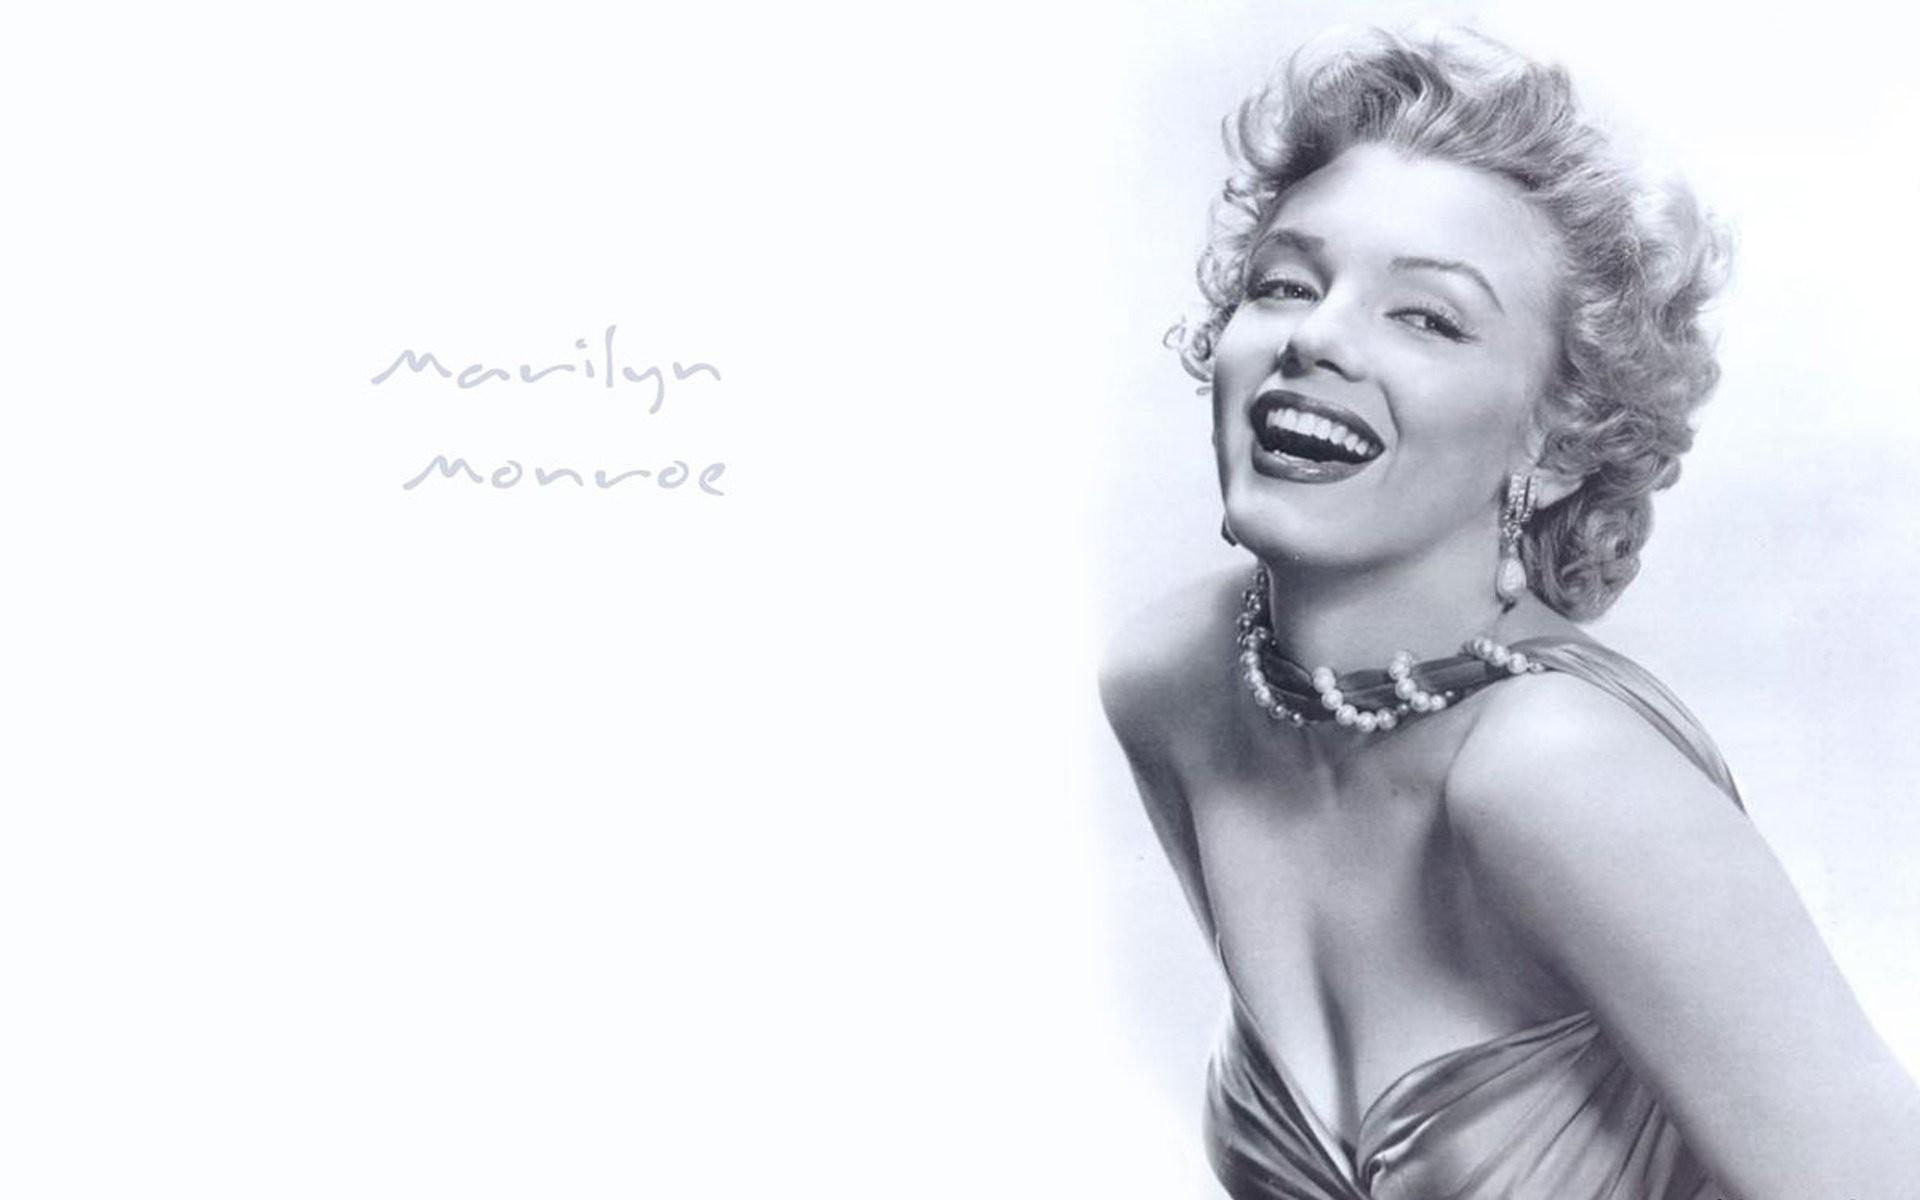 Res: 1920x1200, Hot Marilyn Monroe Wallpaper HD PixelsTalk IPhone Marilyn monroe Wallpapers  HD, Desktop Backgrounds